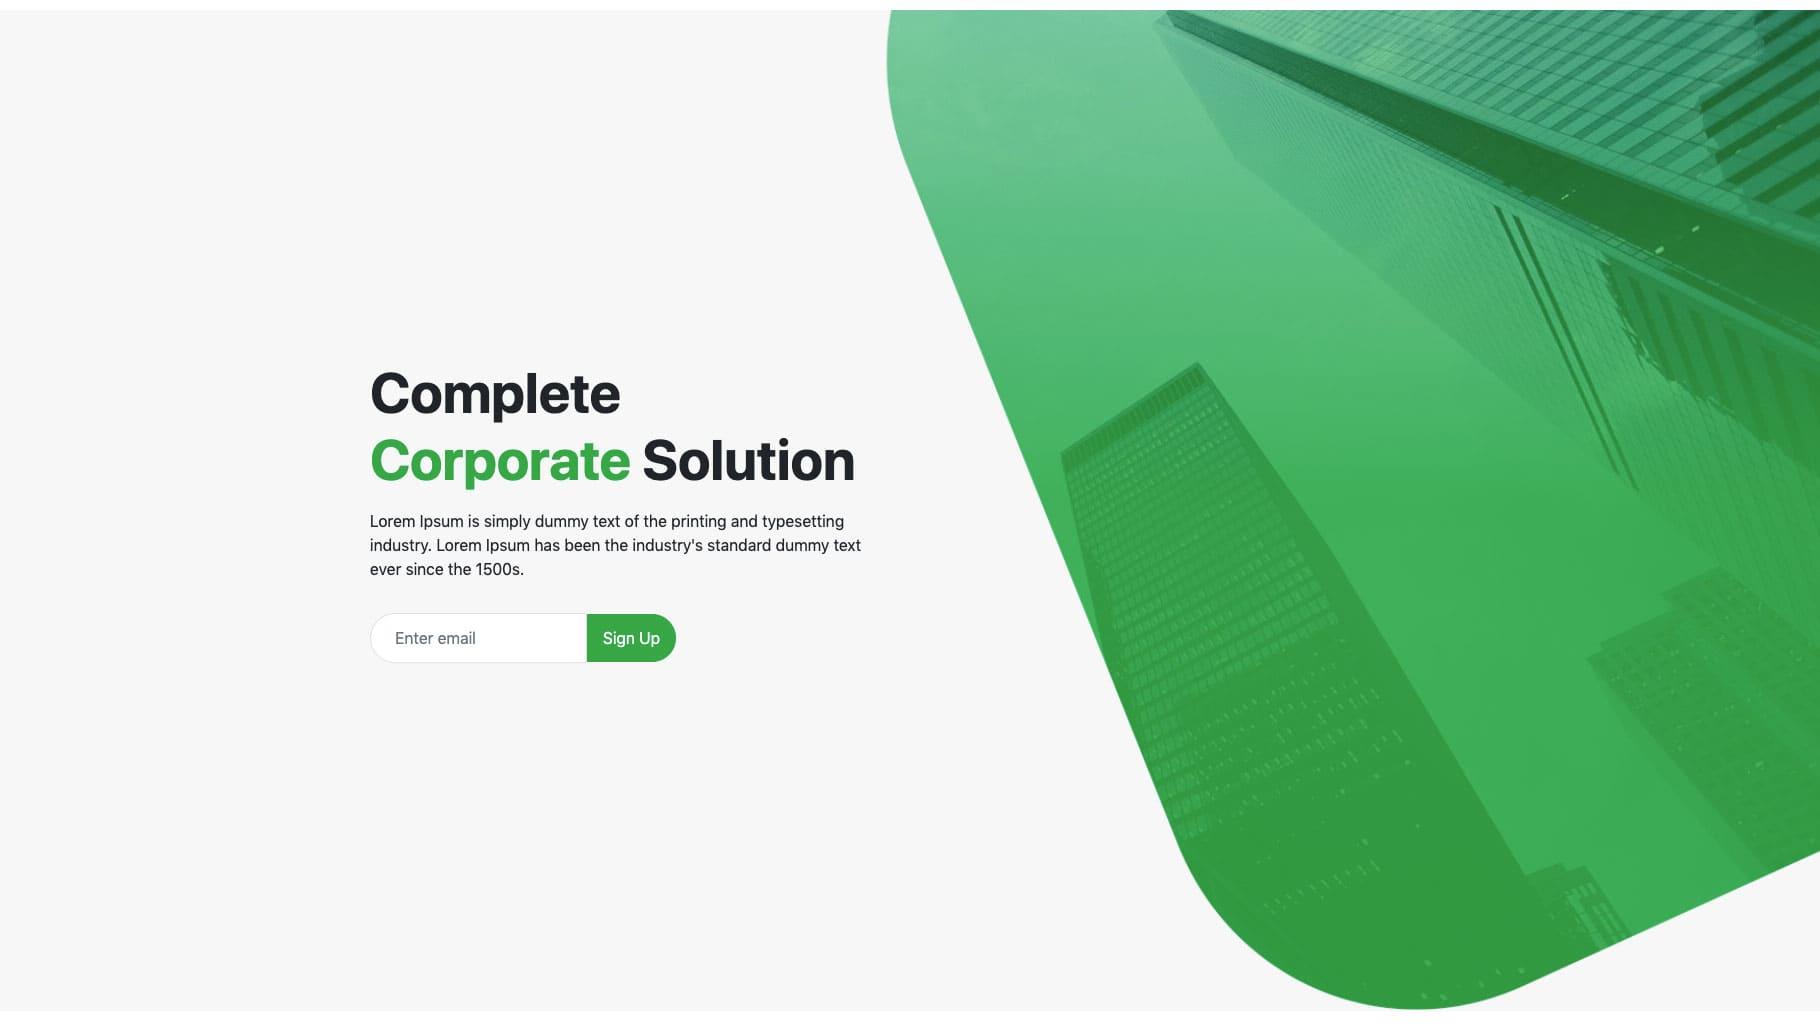 Bootstrap fullscreen header design